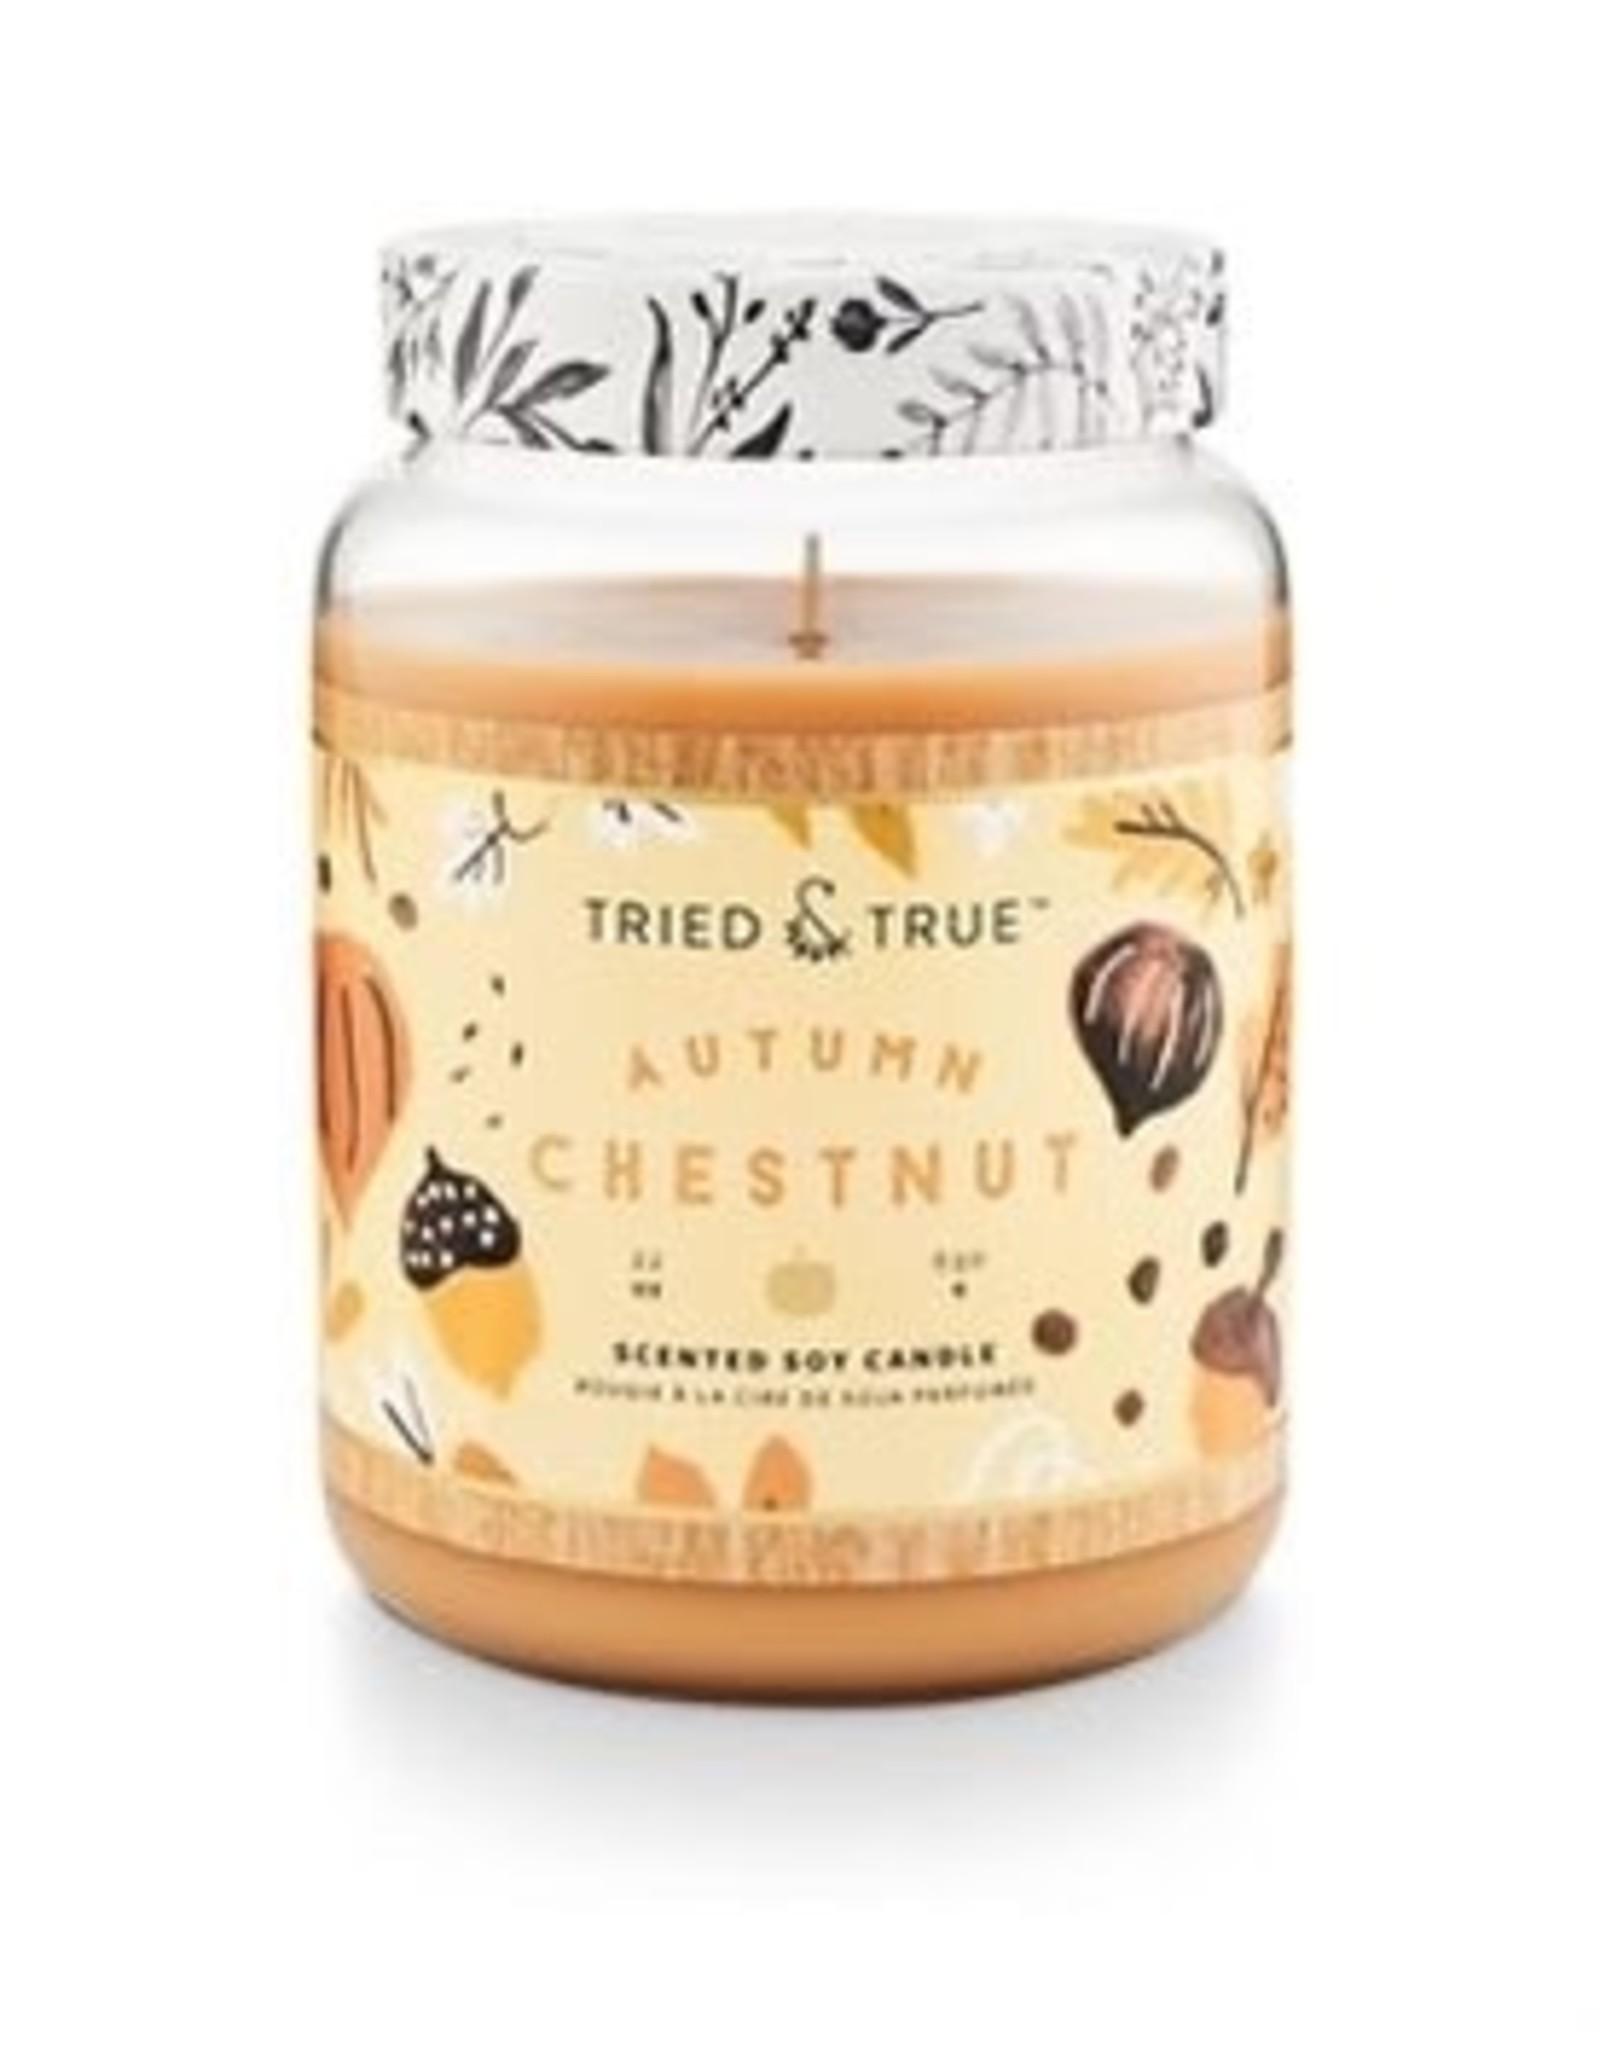 The Florist & The Merchant Autumn Chestnut Home Fragrance